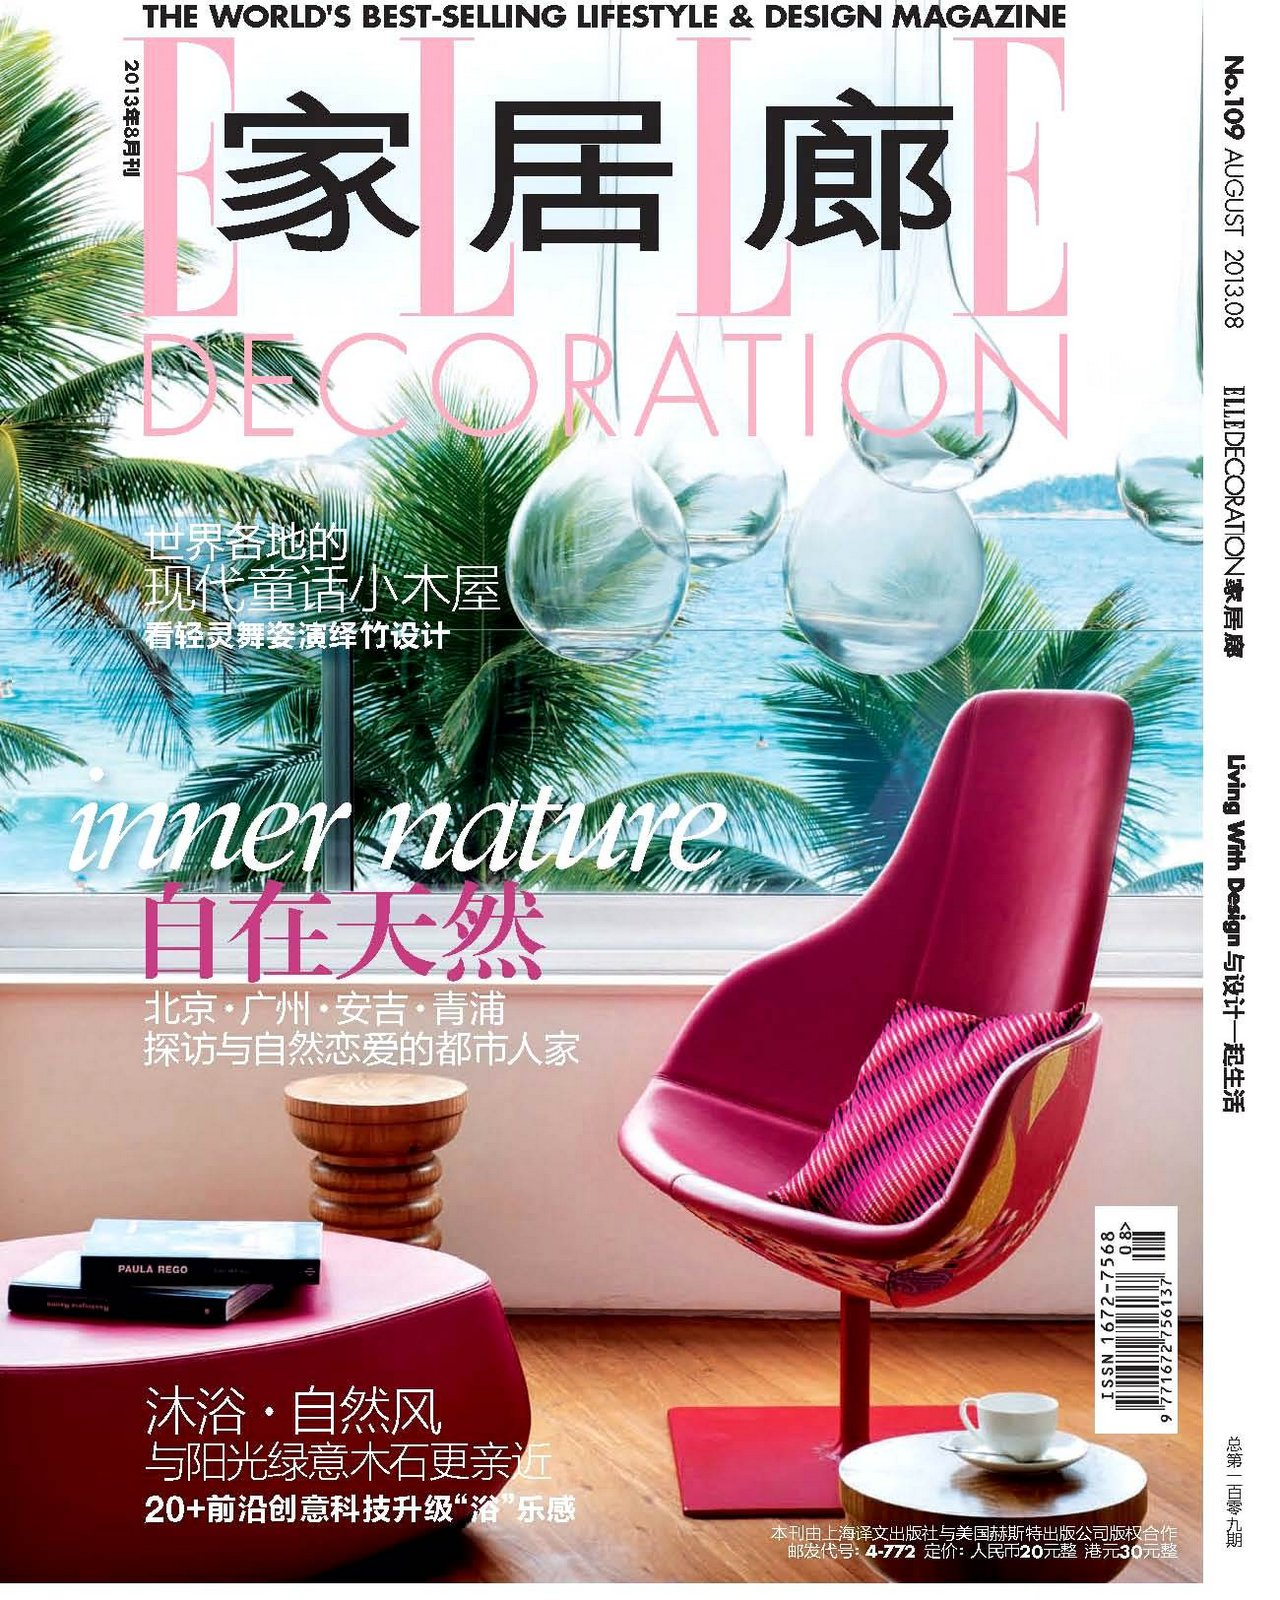 2013_08_Elle decor China.jpg